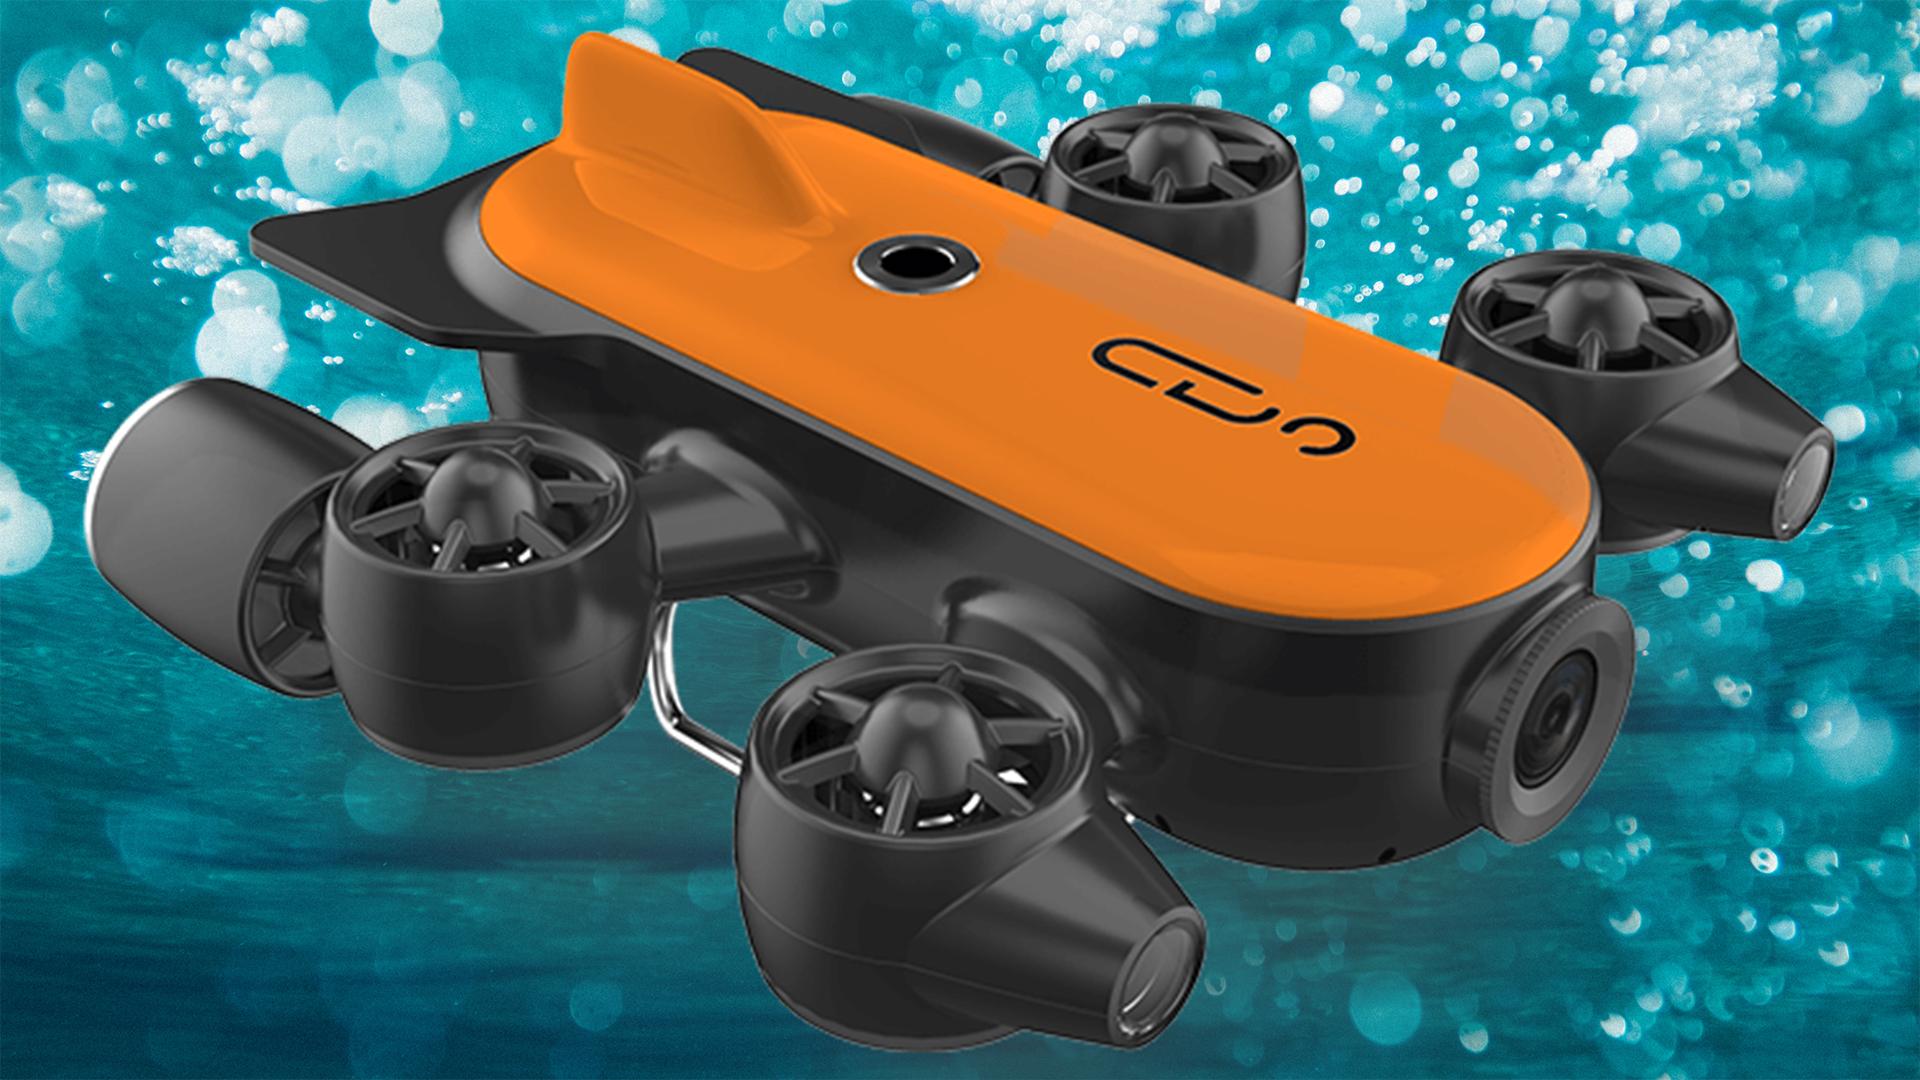 Geneinnoが水中ドローンTitan をKickstarterで発表